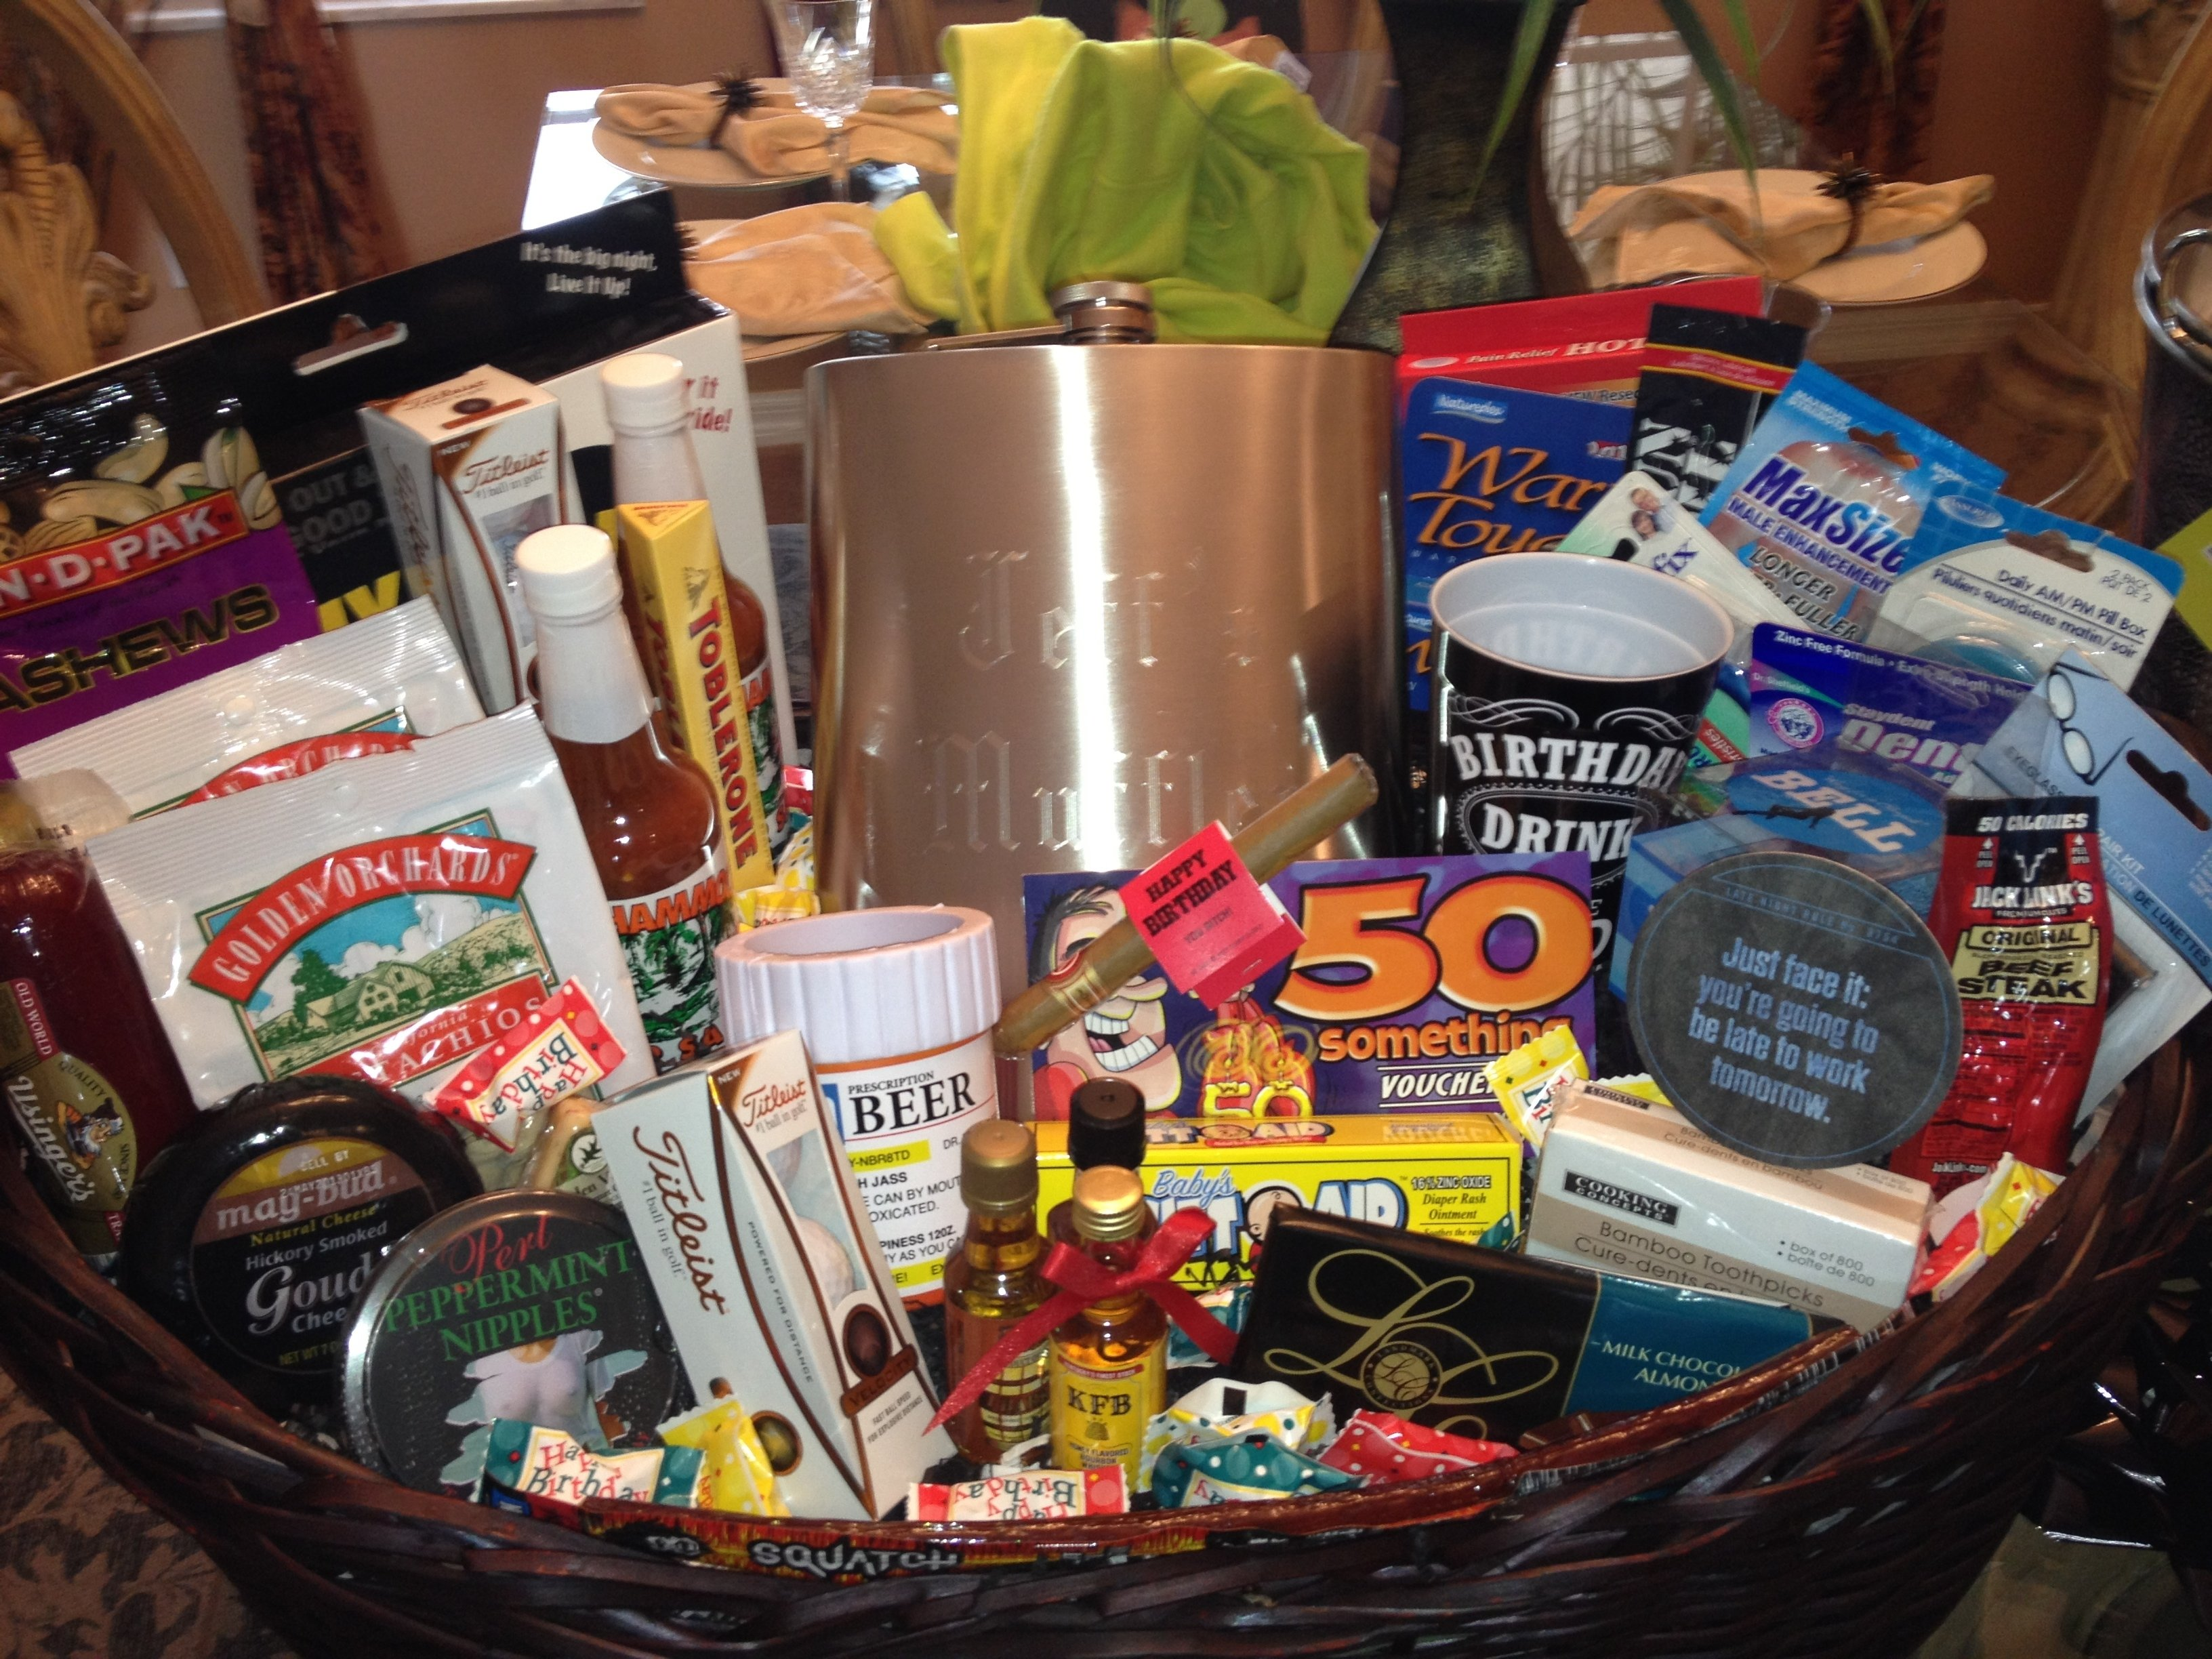 10 Spectacular Ideas For 50Th Birthday Present 50th birthday gift basket for him 50th birthday gift basketw 2020